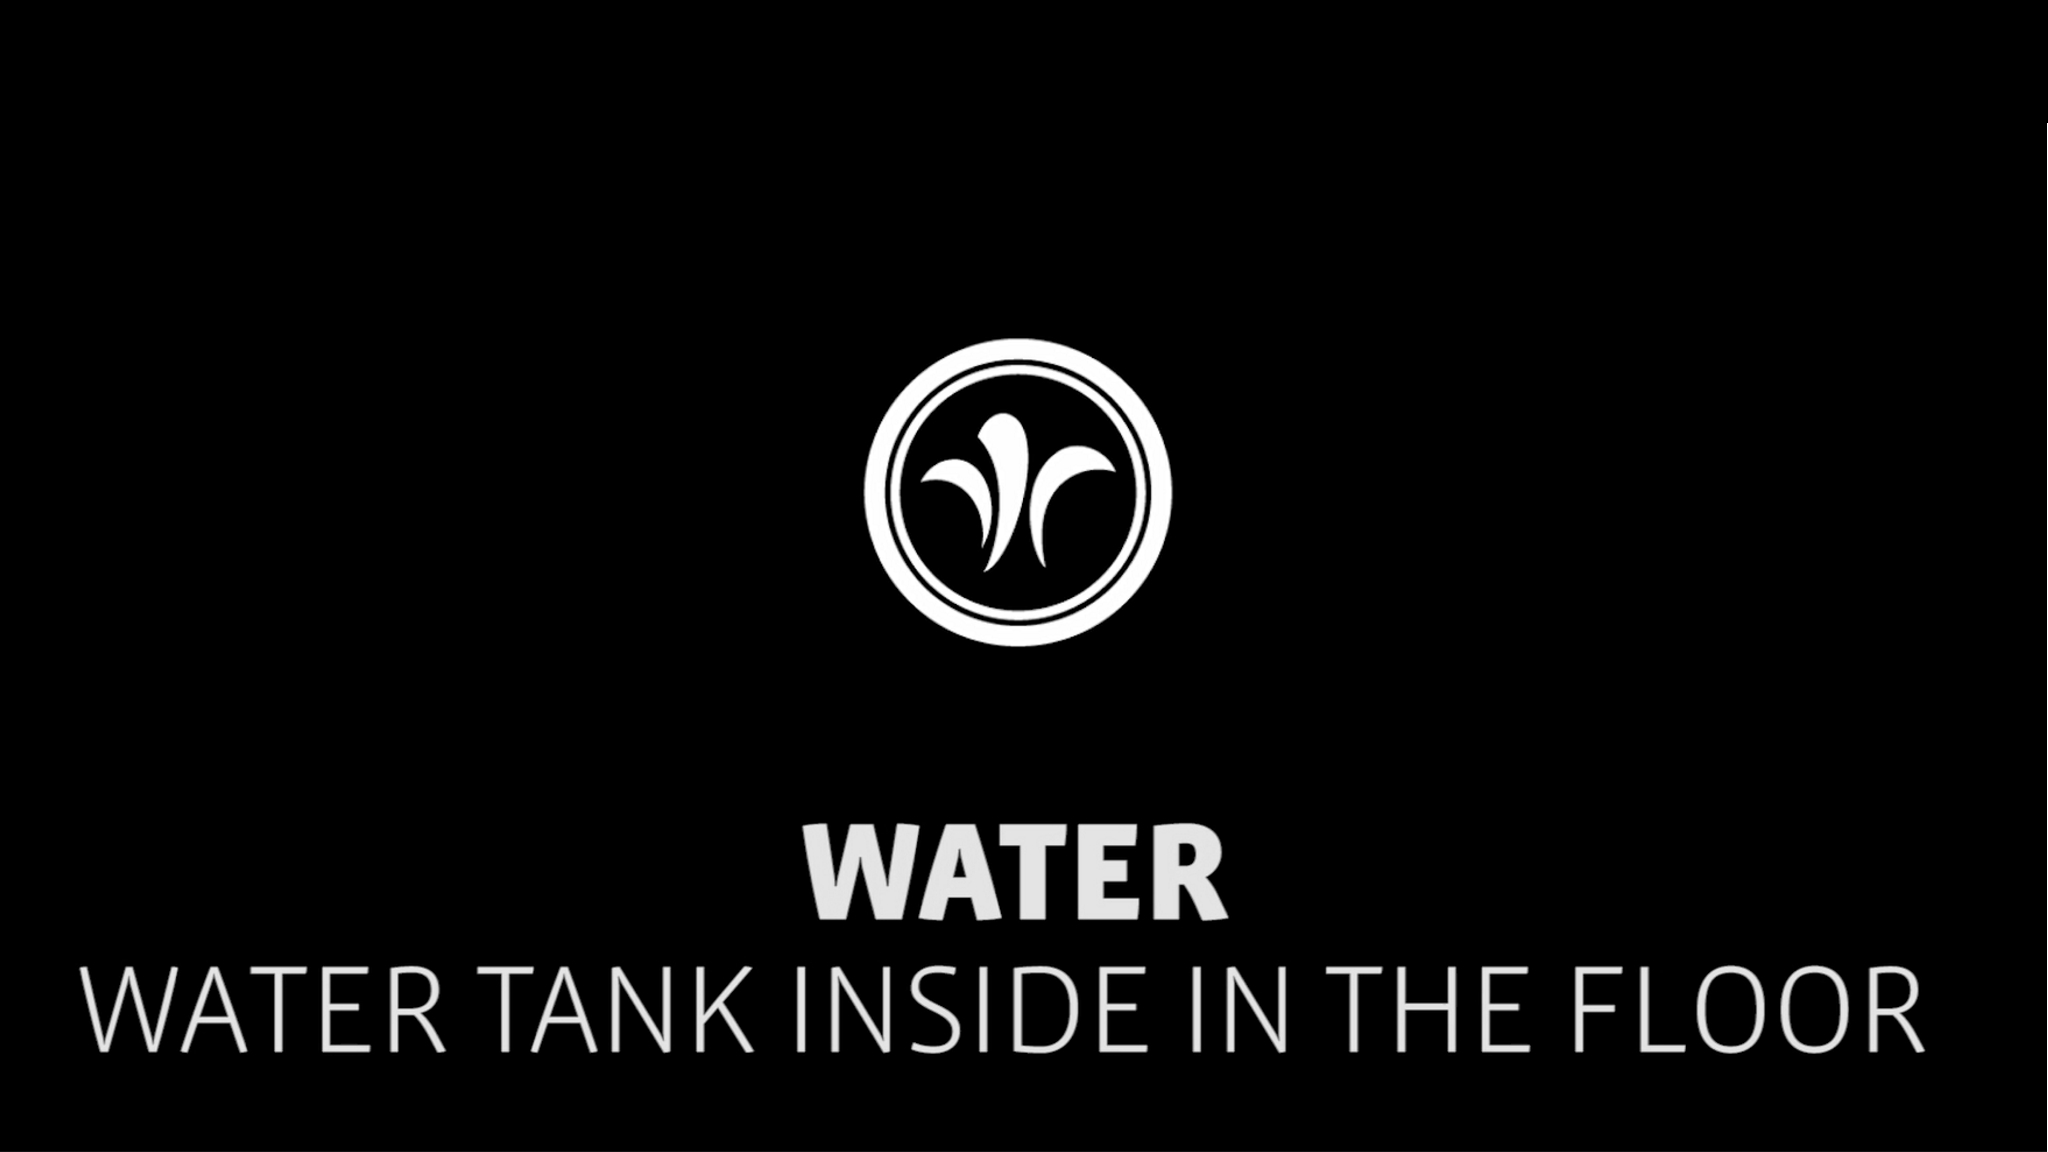 motorhome water tank inside the floor // niesmann+bischoff - camper (model ARTO) // 2019 // WA3